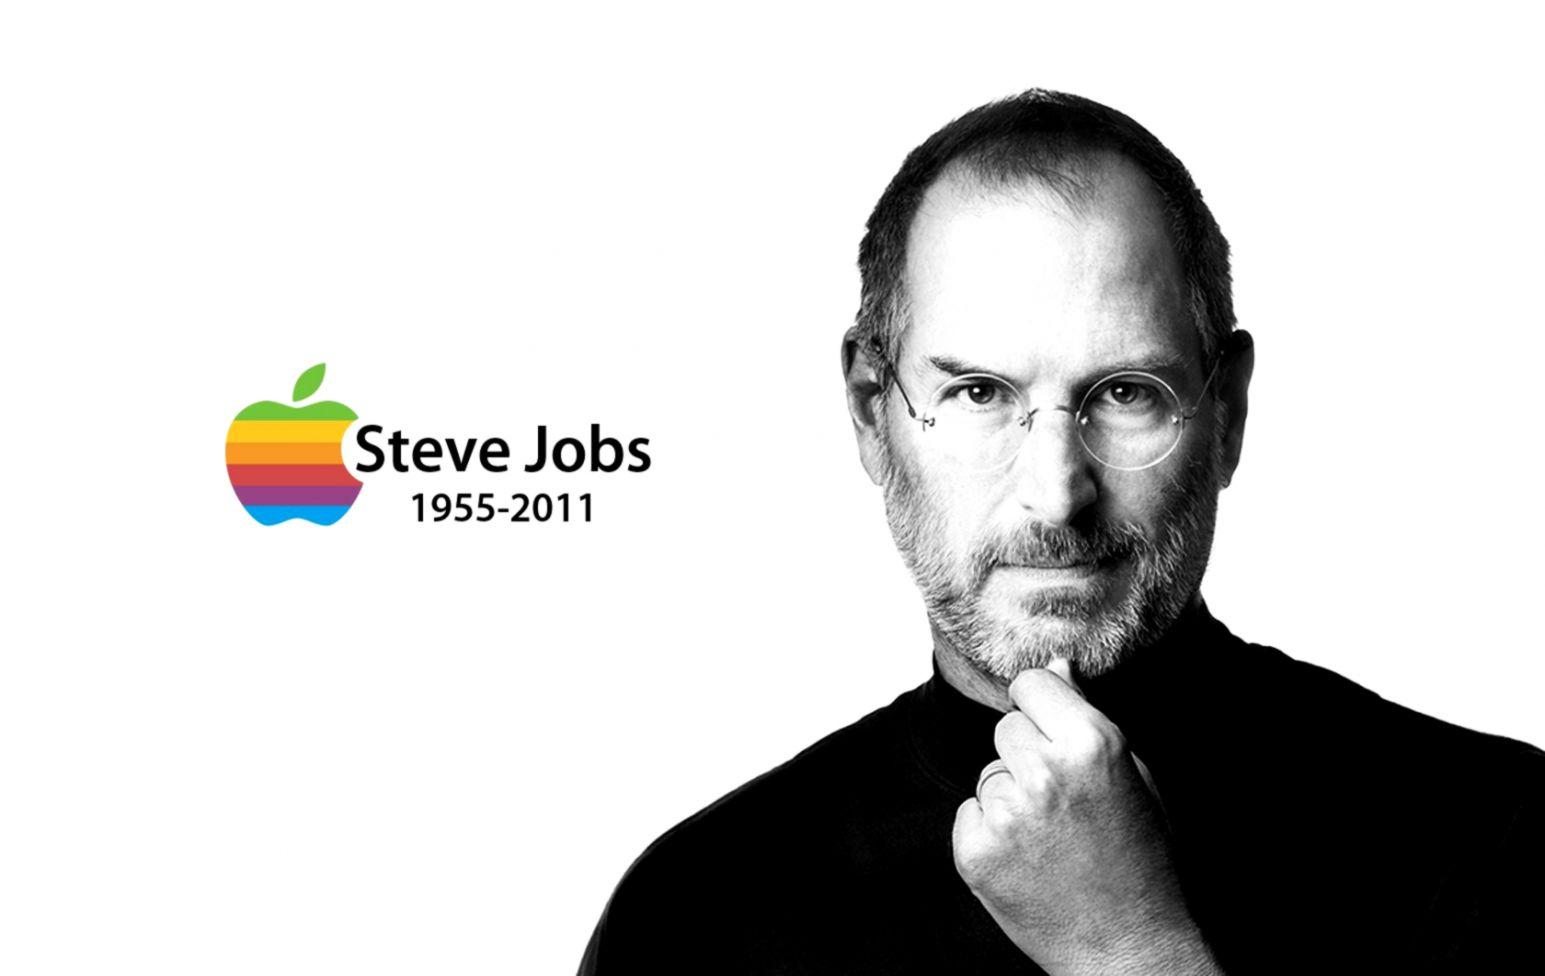 Steve Jobs Wallpaper Wallpapers Land